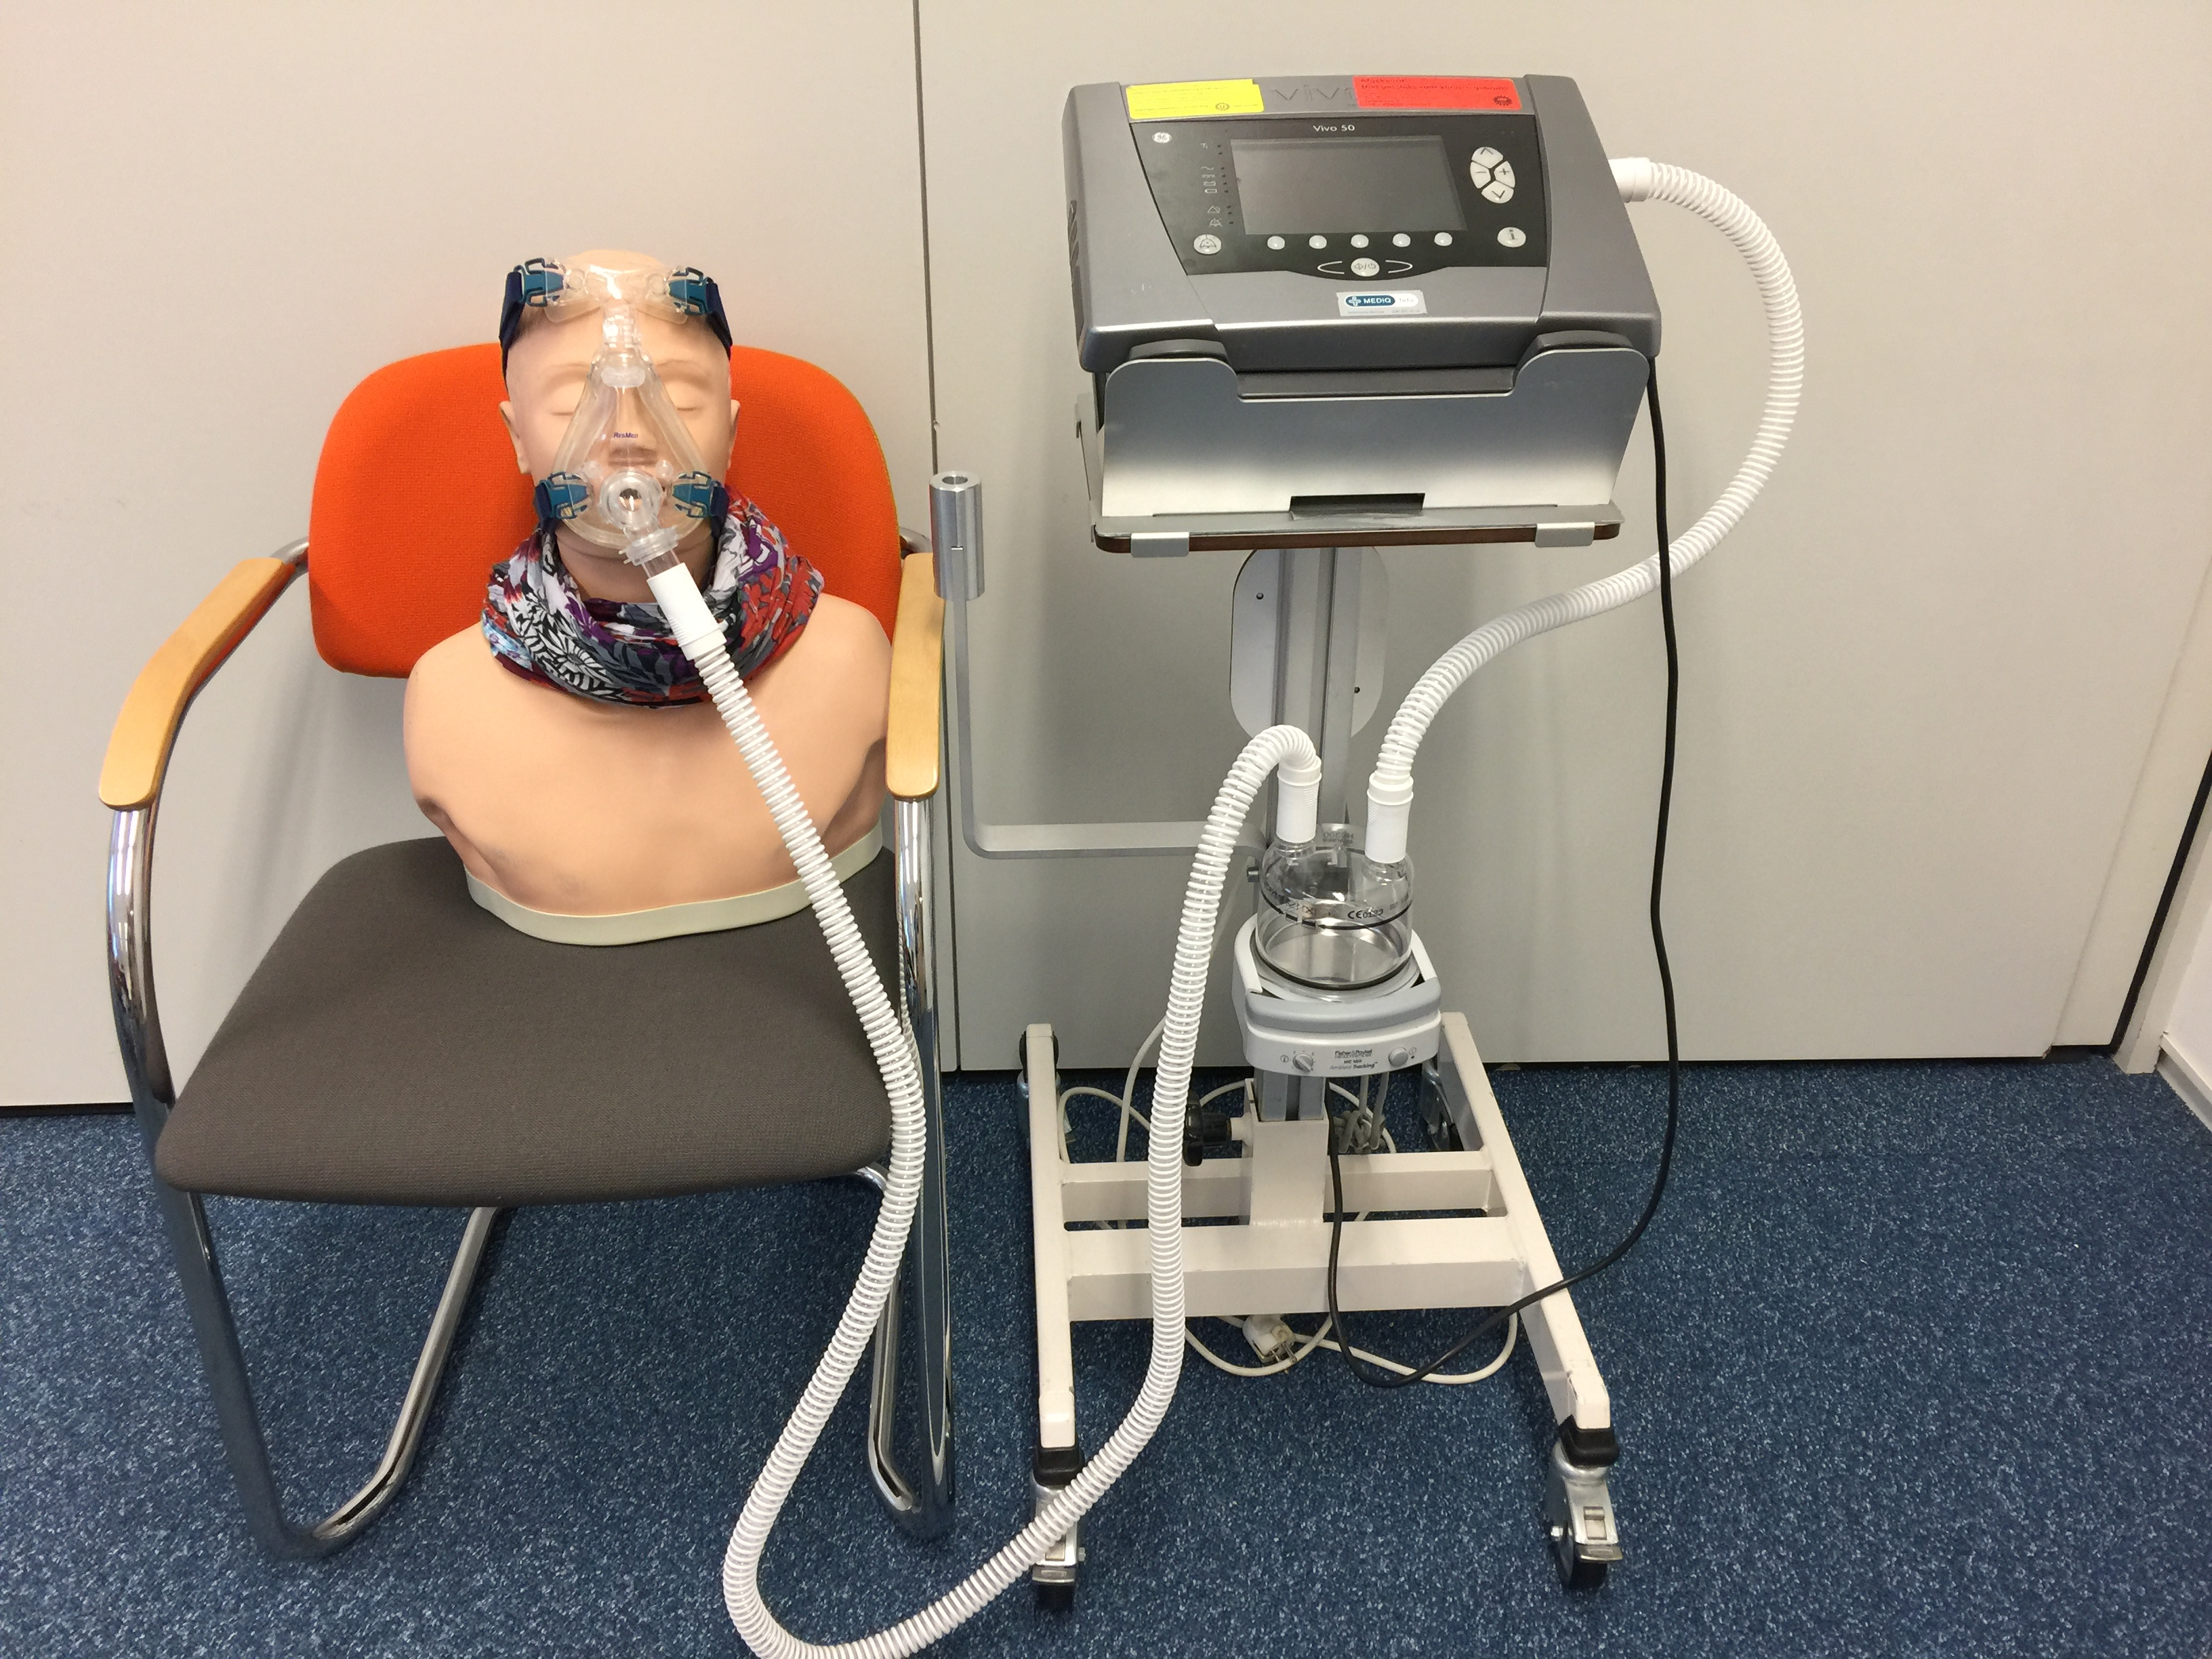 Beademingsapparaat Vivo 50 masker beademing niet invasief non filter slangensysteem filters o2 zuurstof